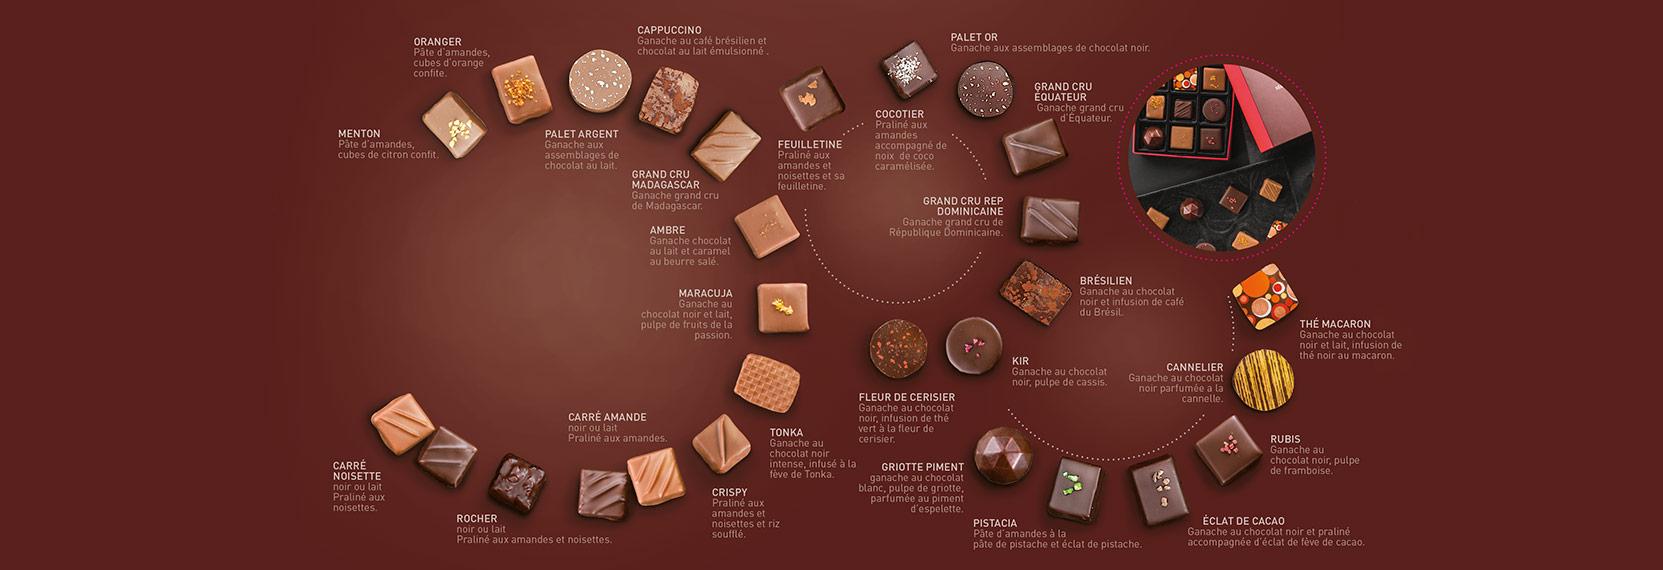 coffret luxe 90 chocolats fins chocolats btq coffret luxe 90 s bastien h non chocolatier. Black Bedroom Furniture Sets. Home Design Ideas